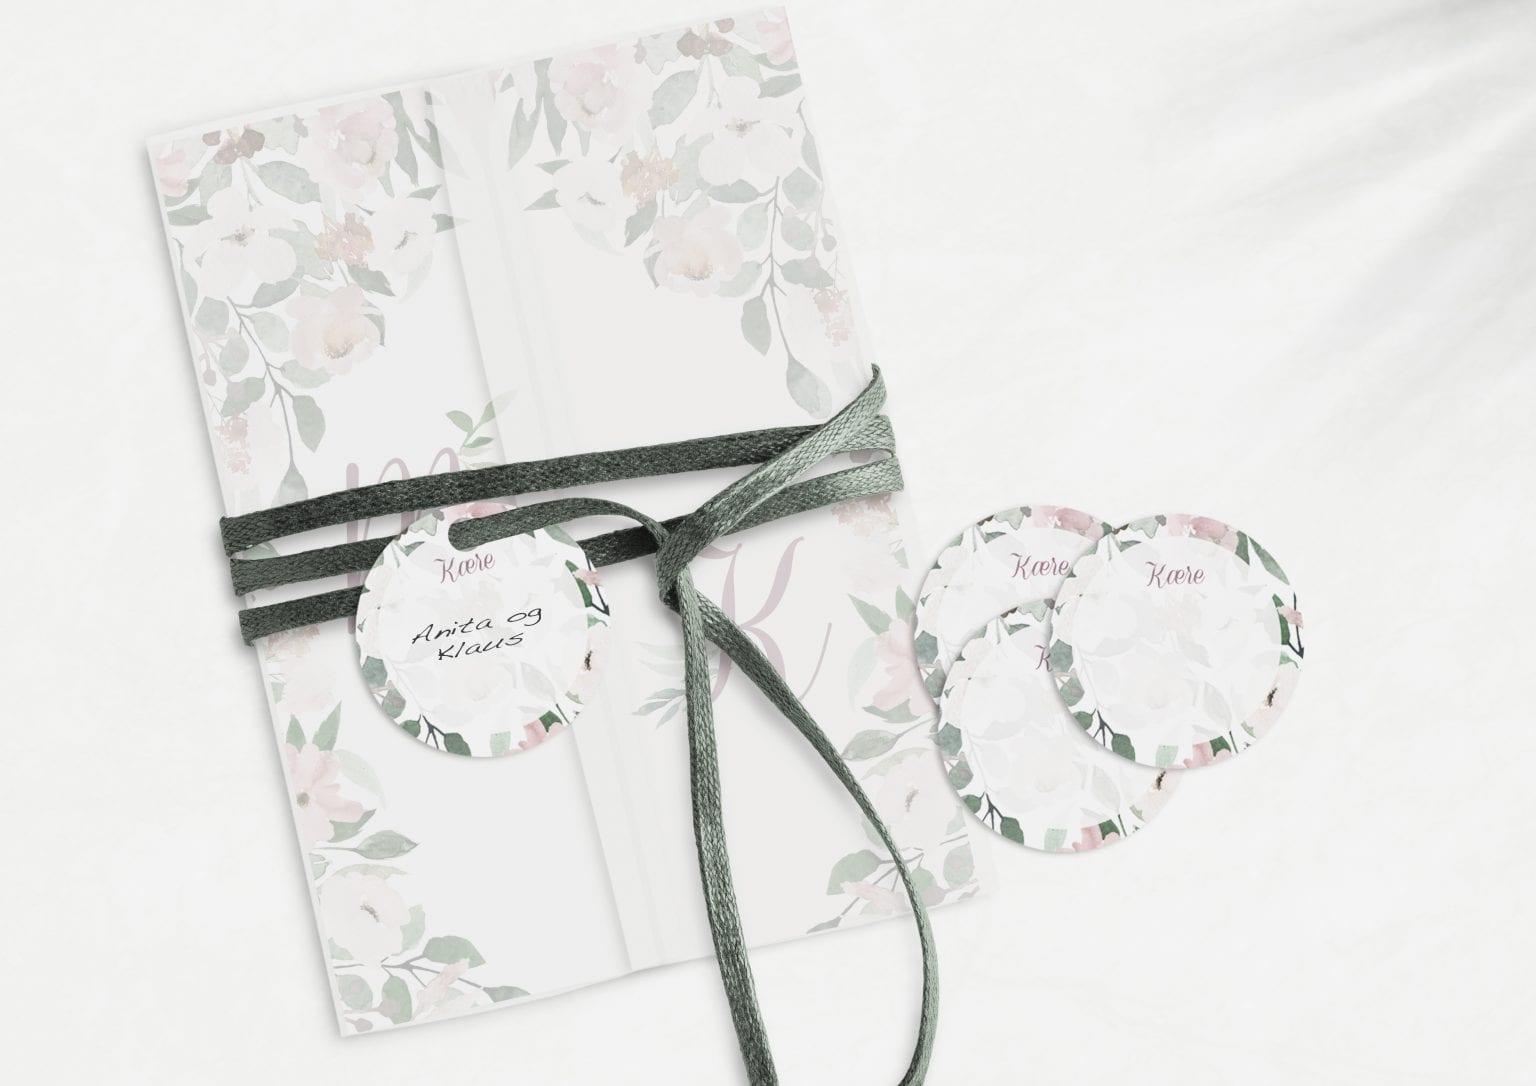 Blush Blossom, manillamærke, bryllup